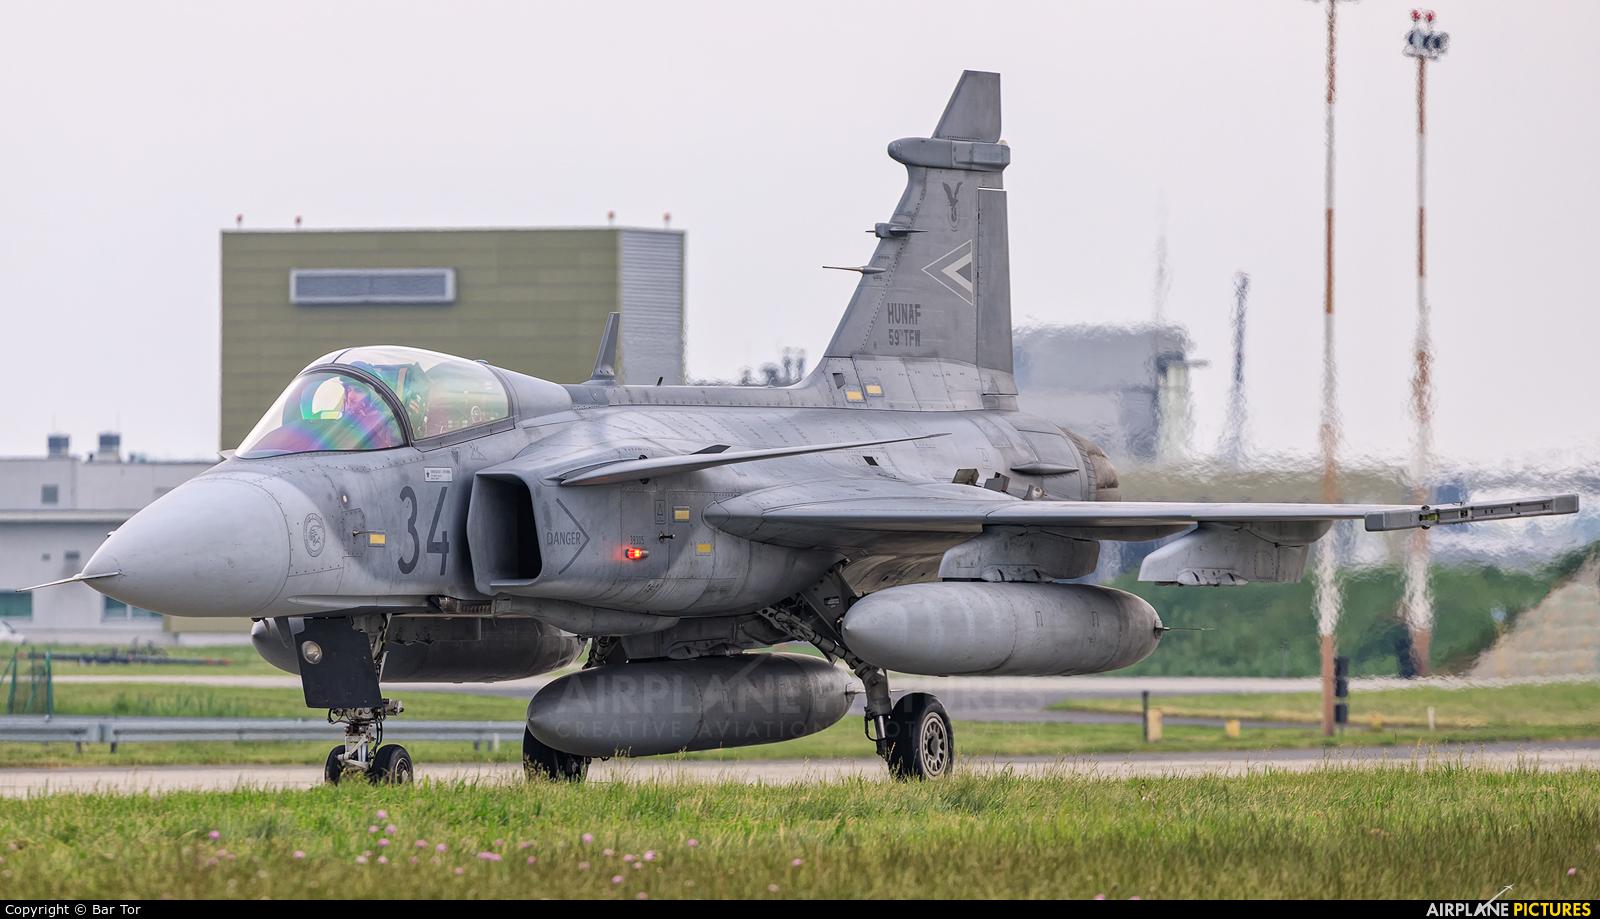 Hungary - Air Force 34 aircraft at Poznań - Krzesiny